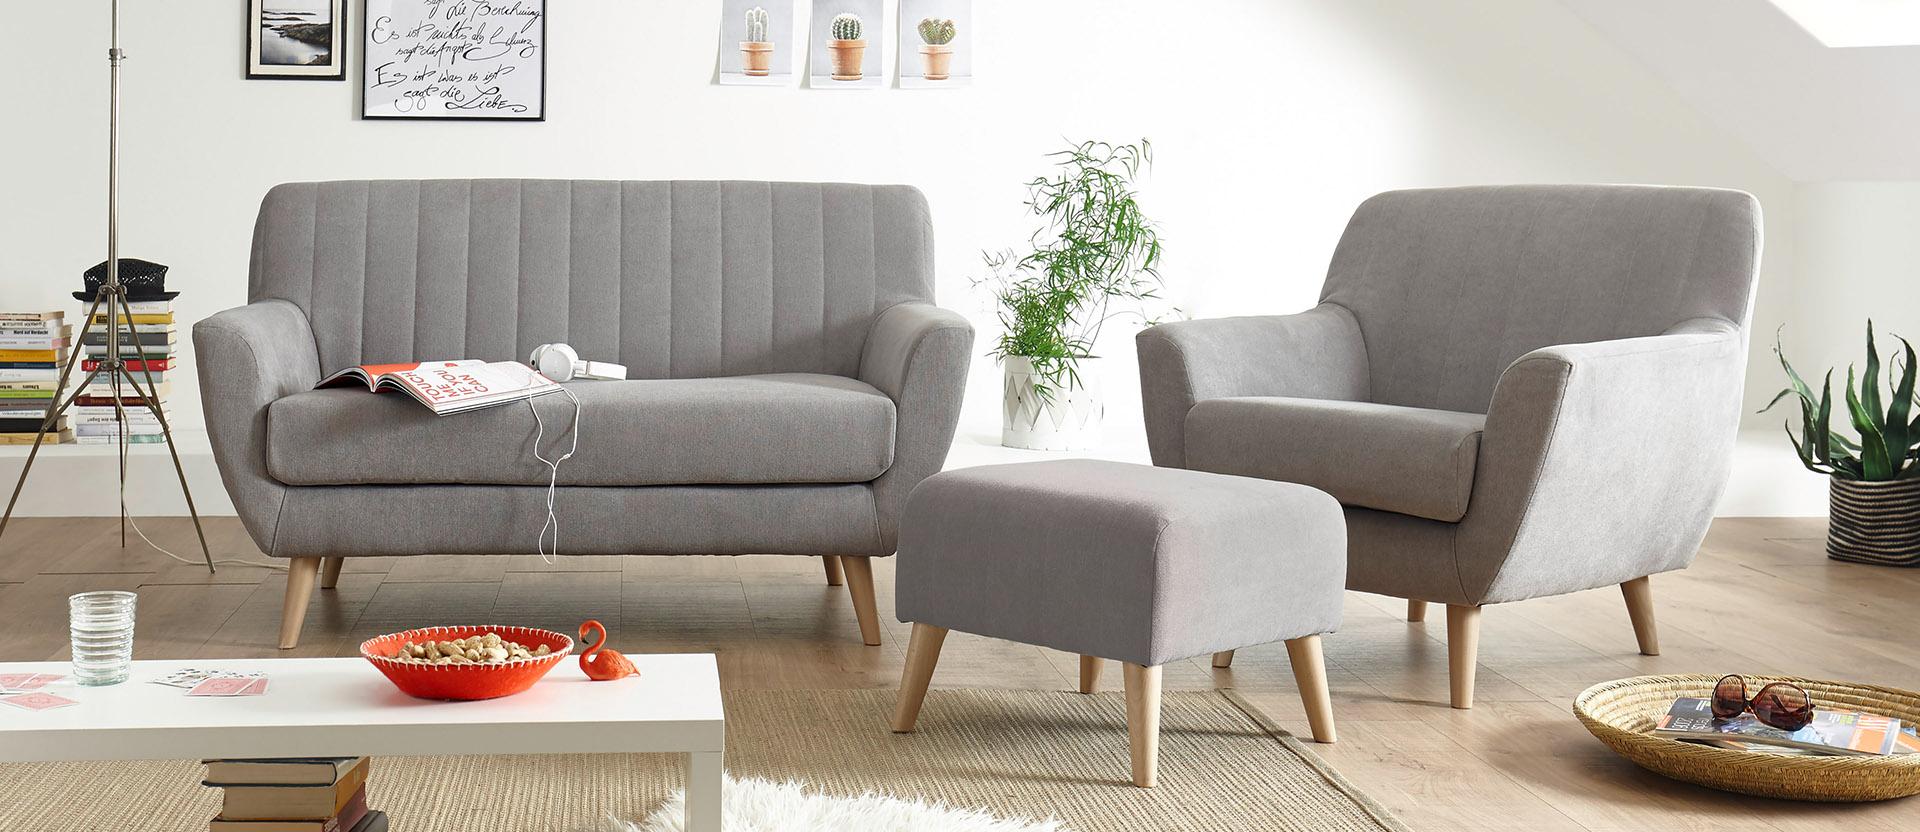 Producent sof i foteli - Meble Polskie